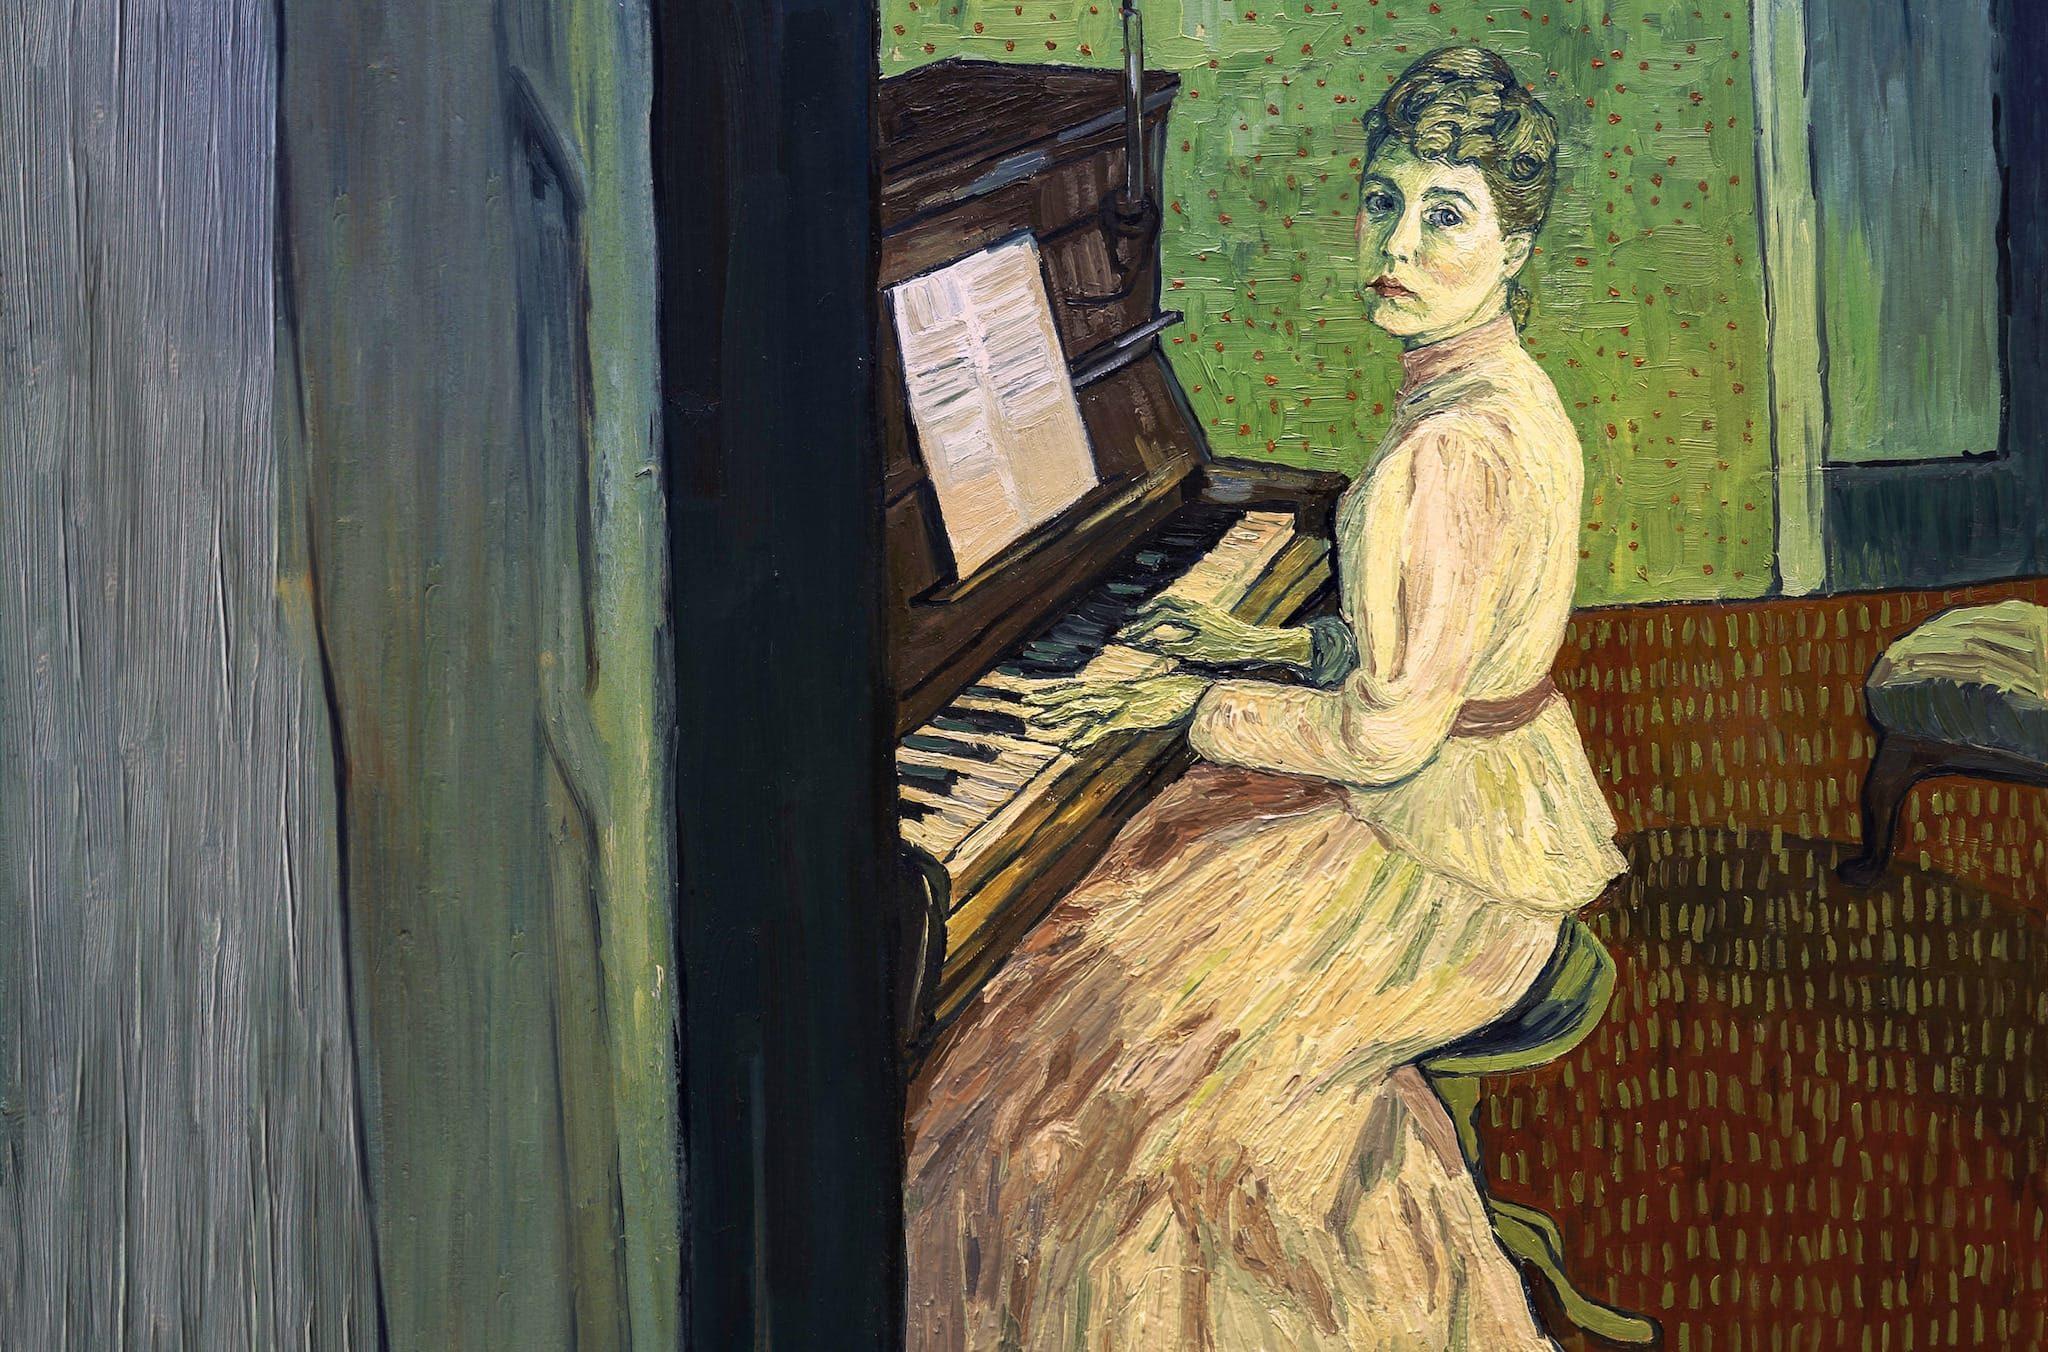 La passion Van Gogh de Dorota Kobiela et Hugh Welchman image film d'animation cinéma